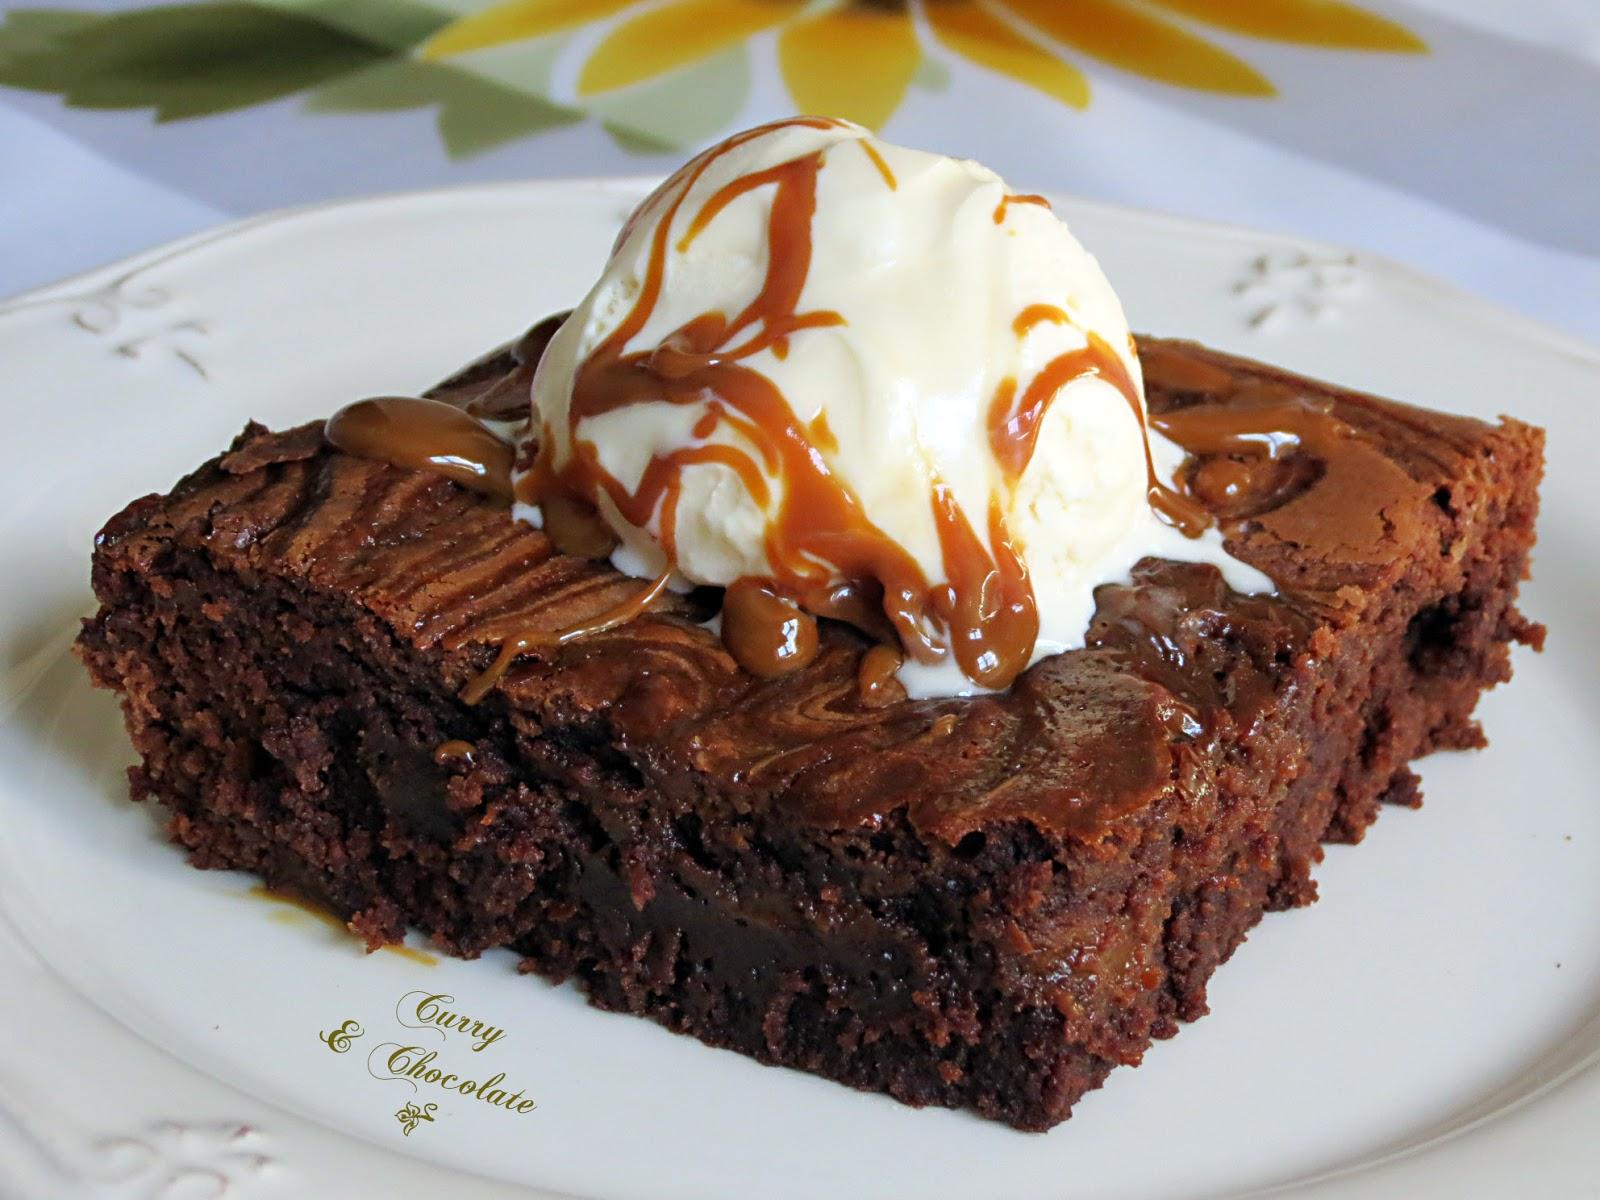 Brownies con dulce de leche – Dulce de leche brownies